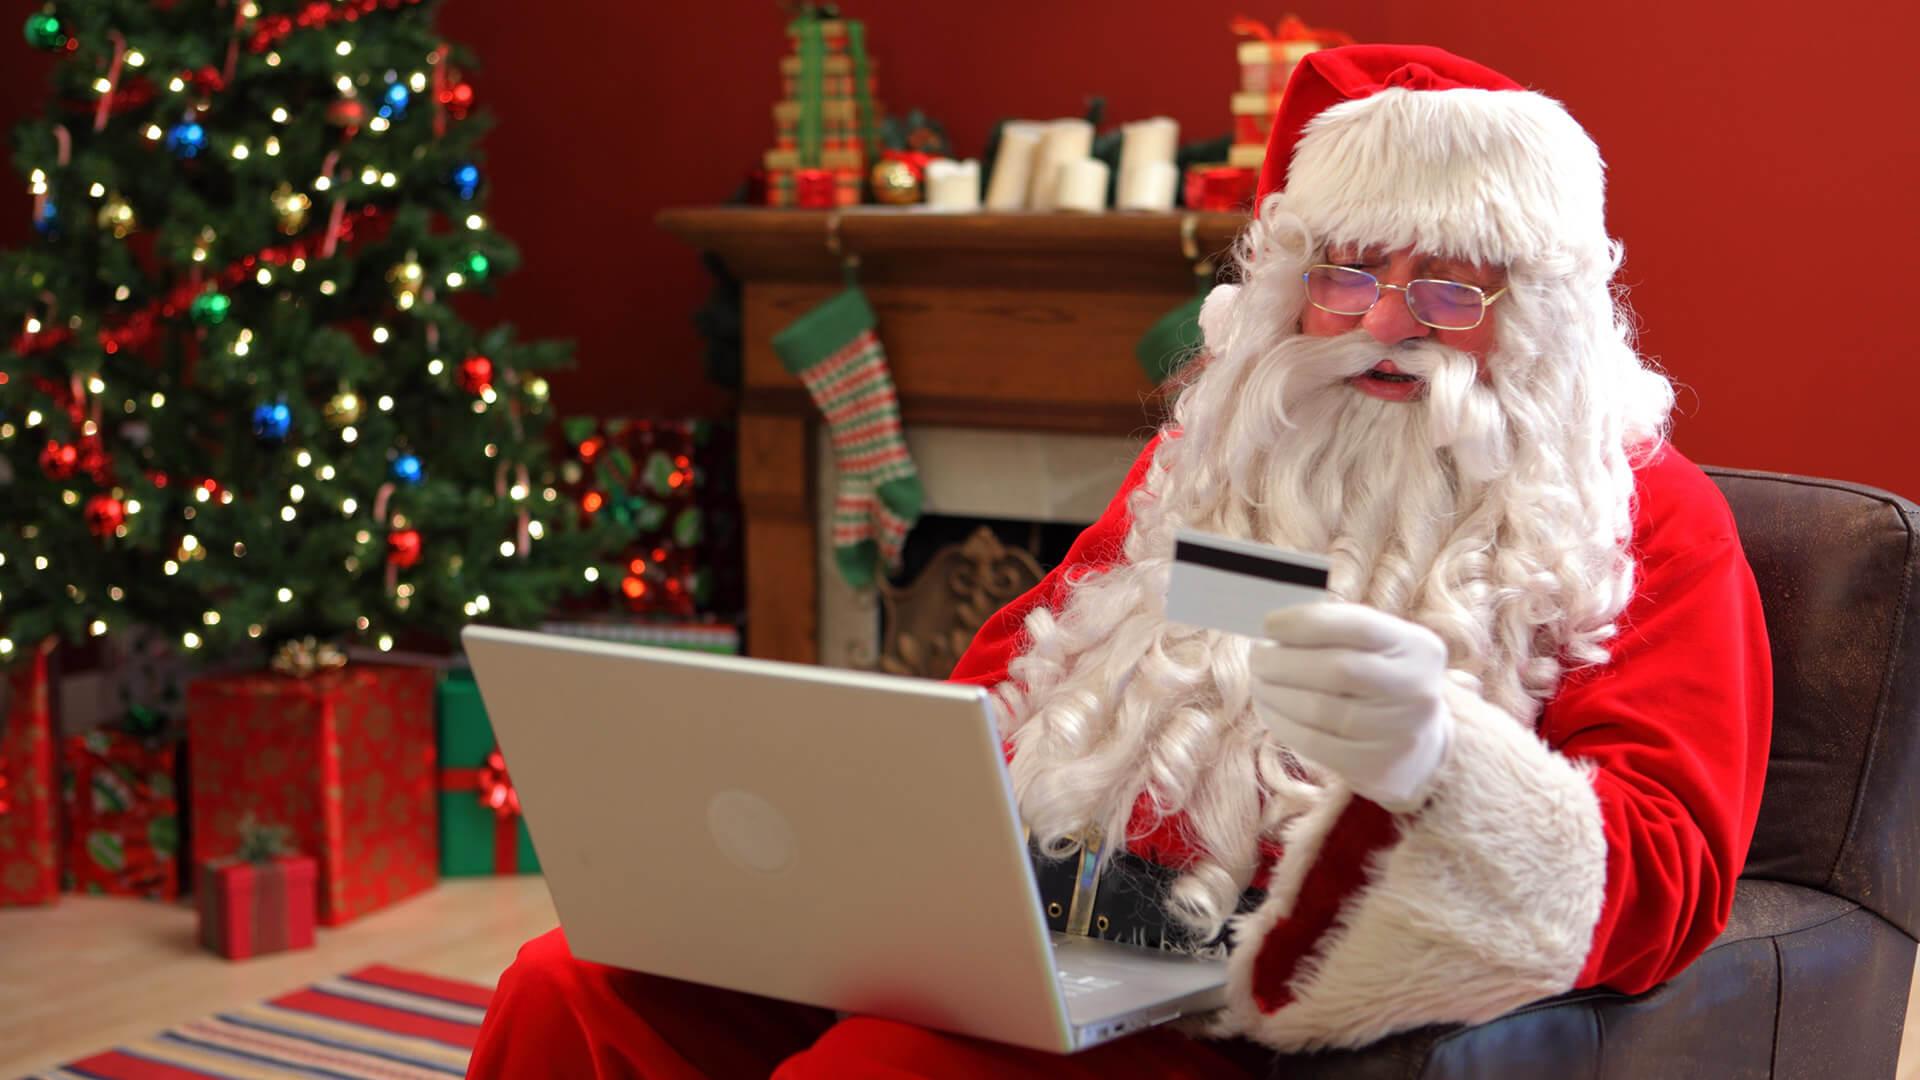 holiday-shopping-ecommerce-santa-ss-1920